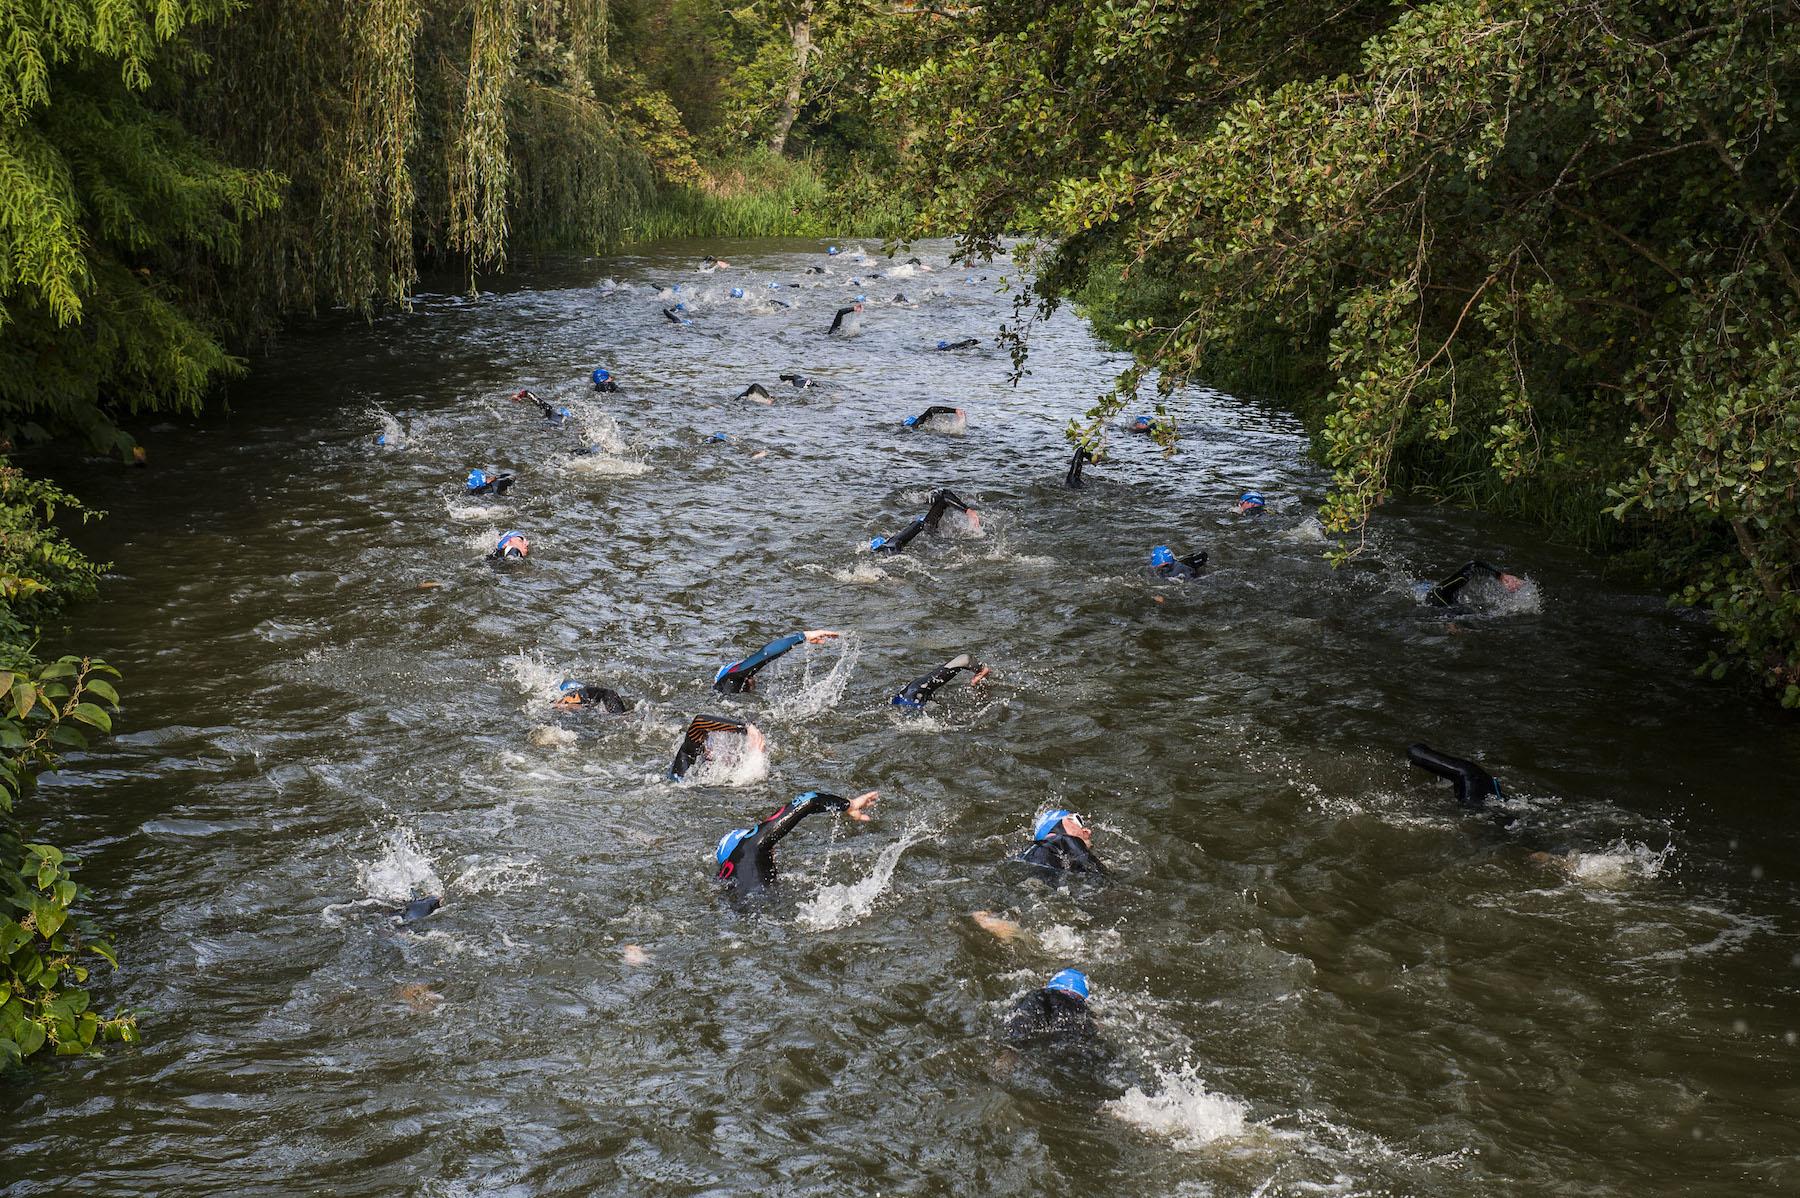 Hever Castle Festival of Endurance \u002D Swim Series - cover image